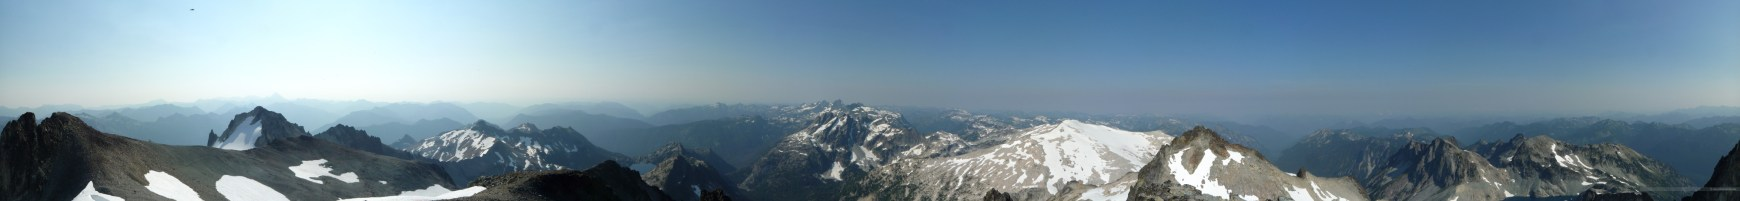 Mt. Daniel Pano